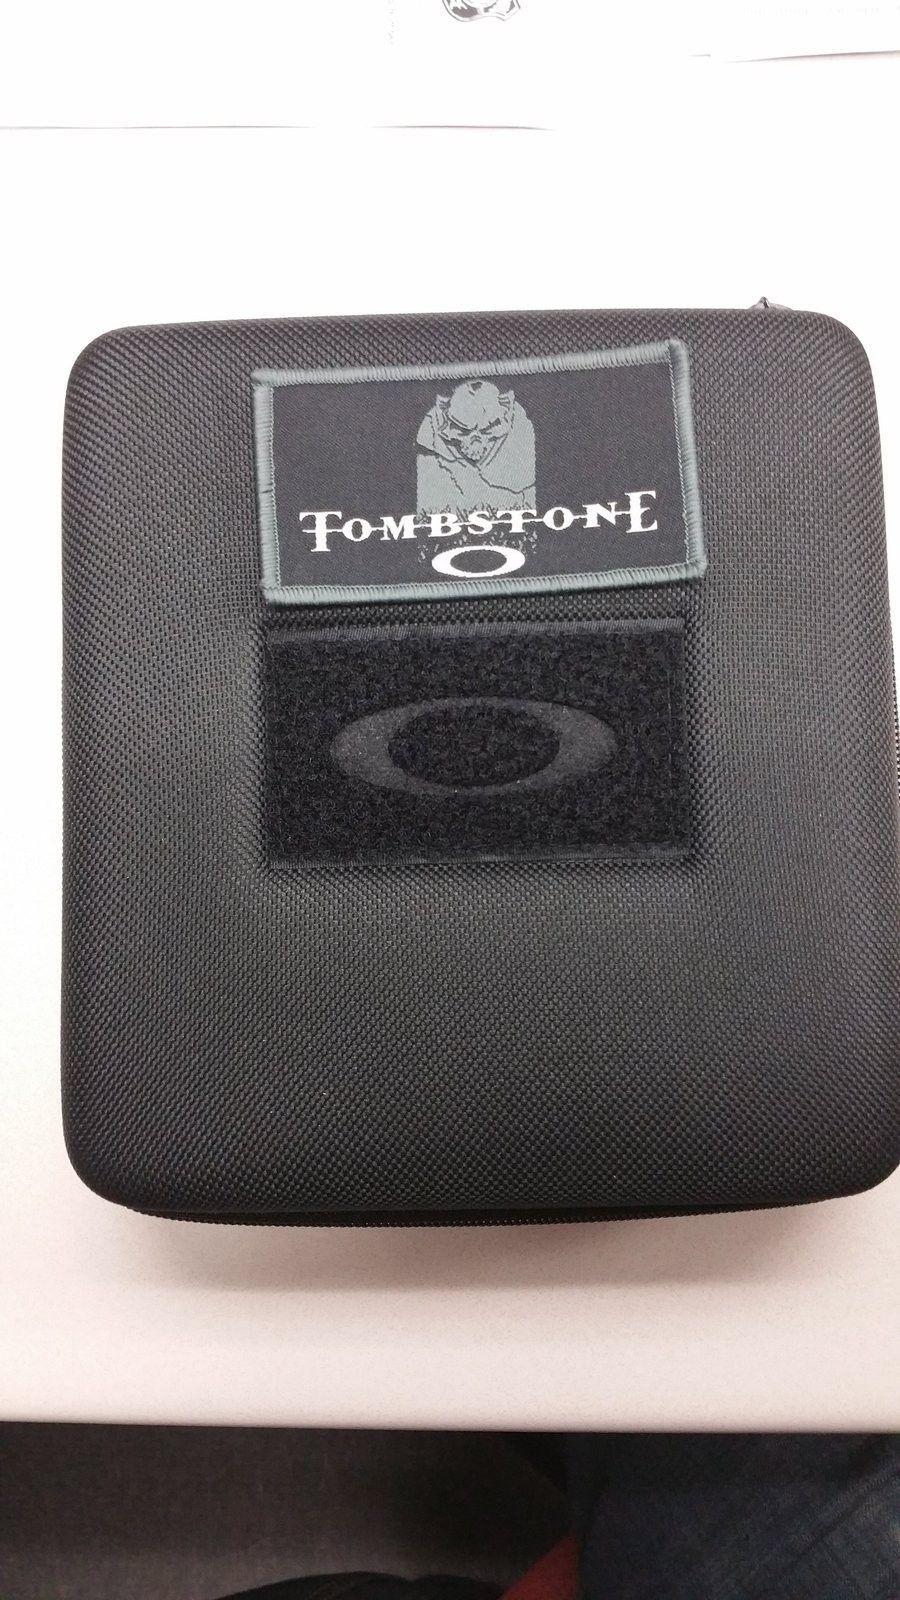 SI Tombstone - uploadfromtaptalk1446599930729.jpg